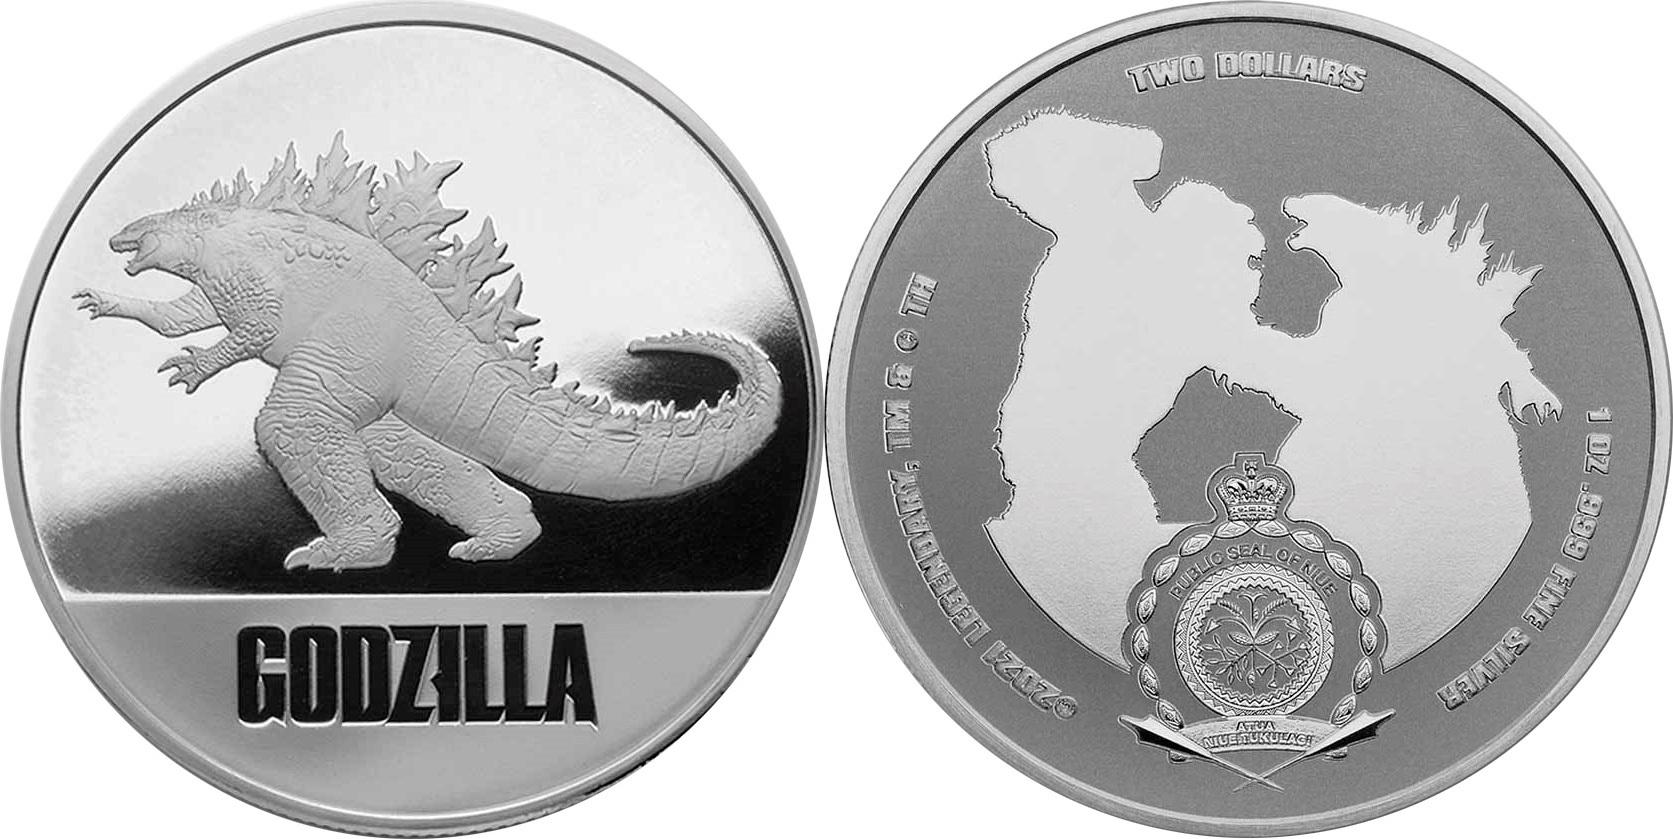 niue-2021-godzilla